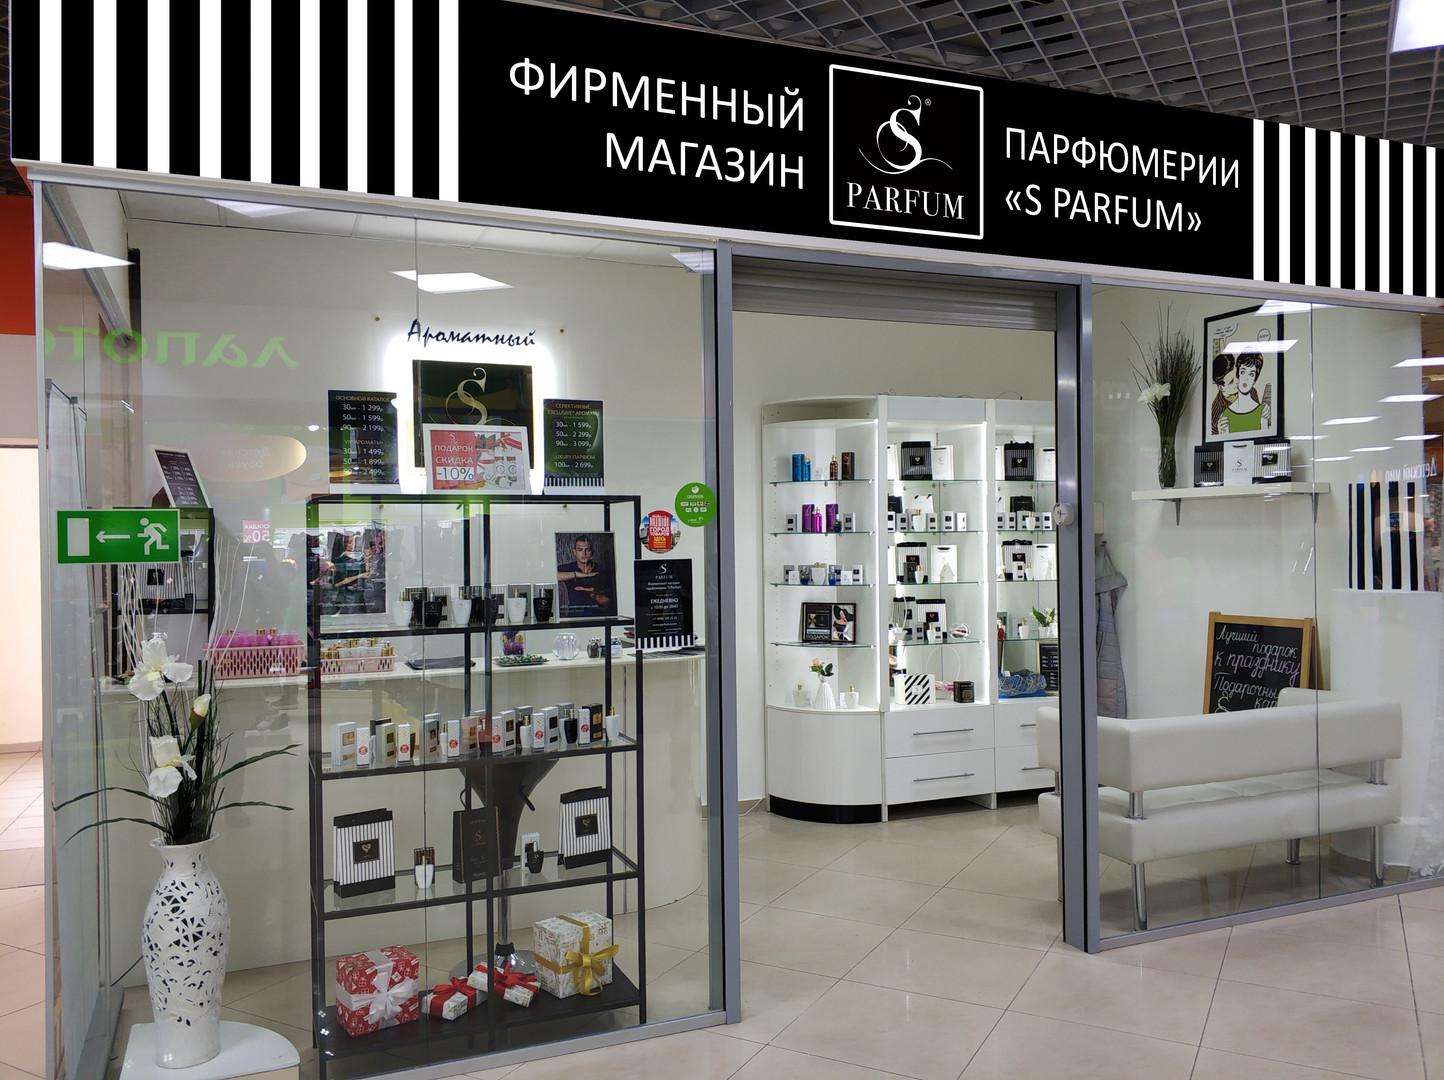 S PARFUM Москва.jpg